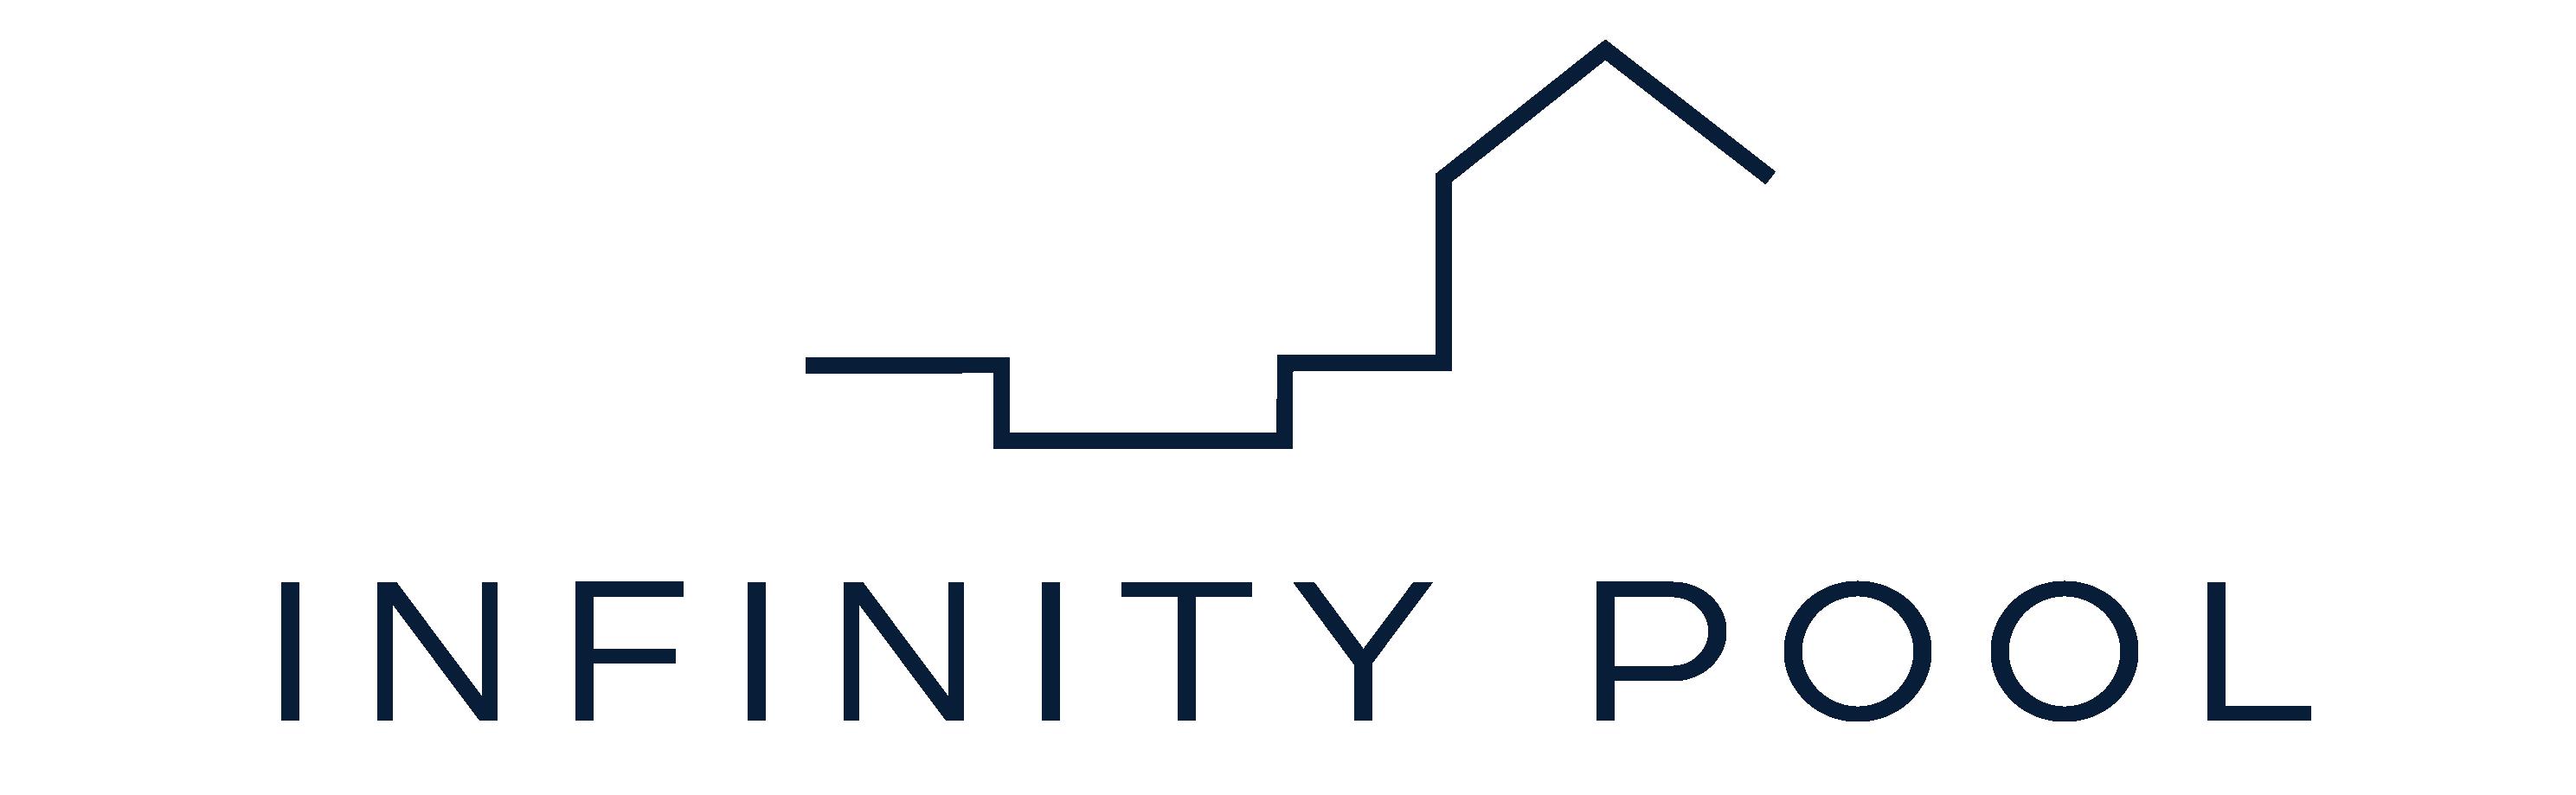 logo infinity pool-bordeaux piscines traditionnelles